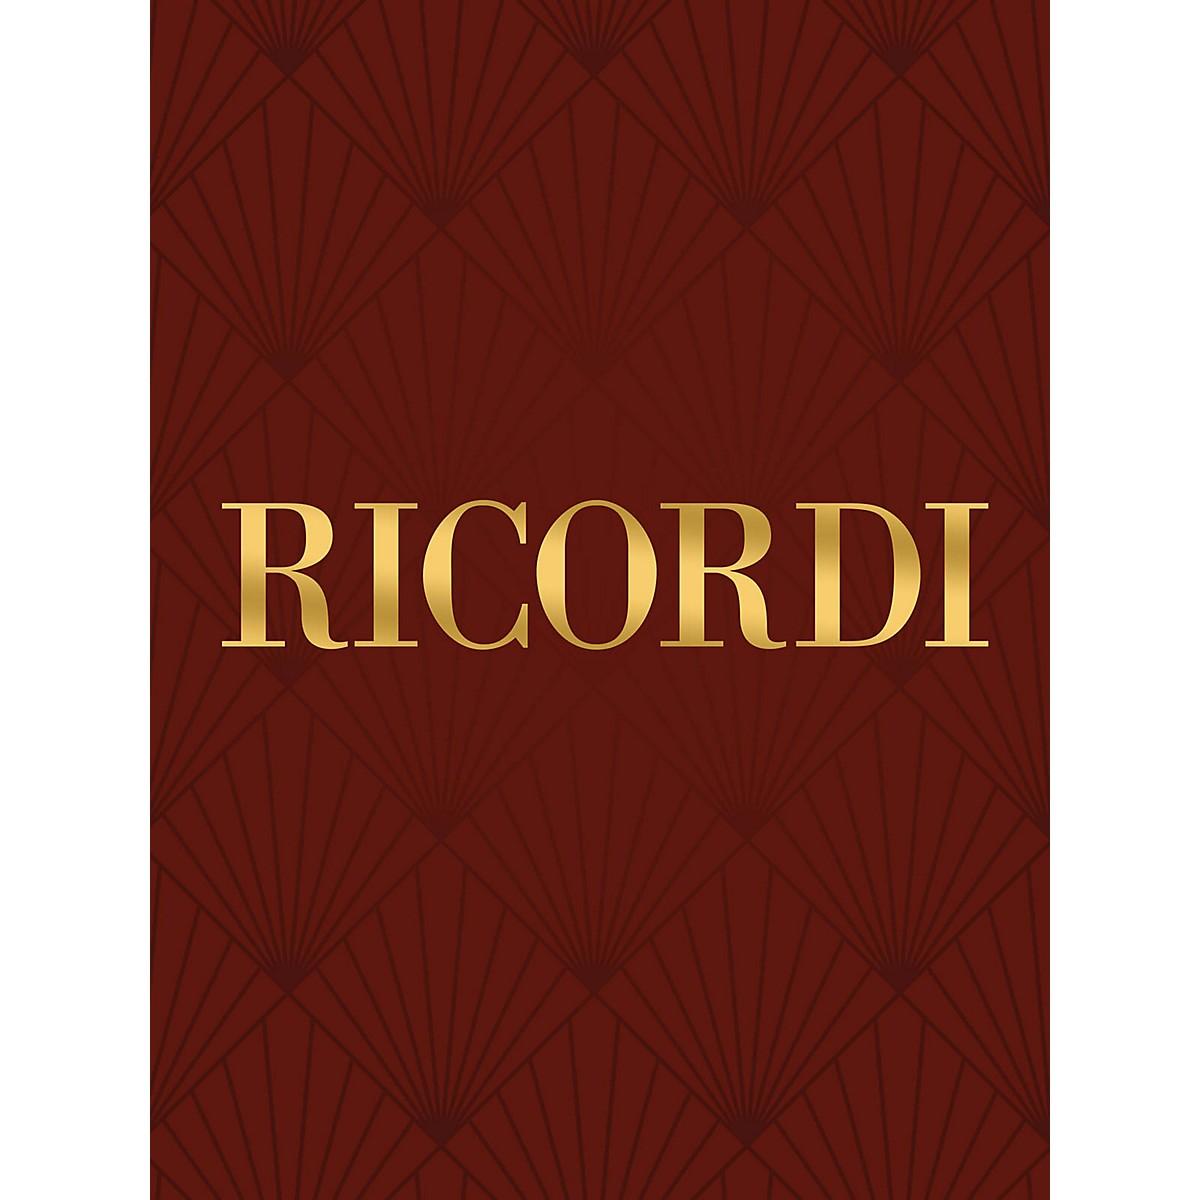 Ricordi Hungarian Rhapsody No. 2 (Piano Duet) Piano Duet Series Composed by Franz Liszt